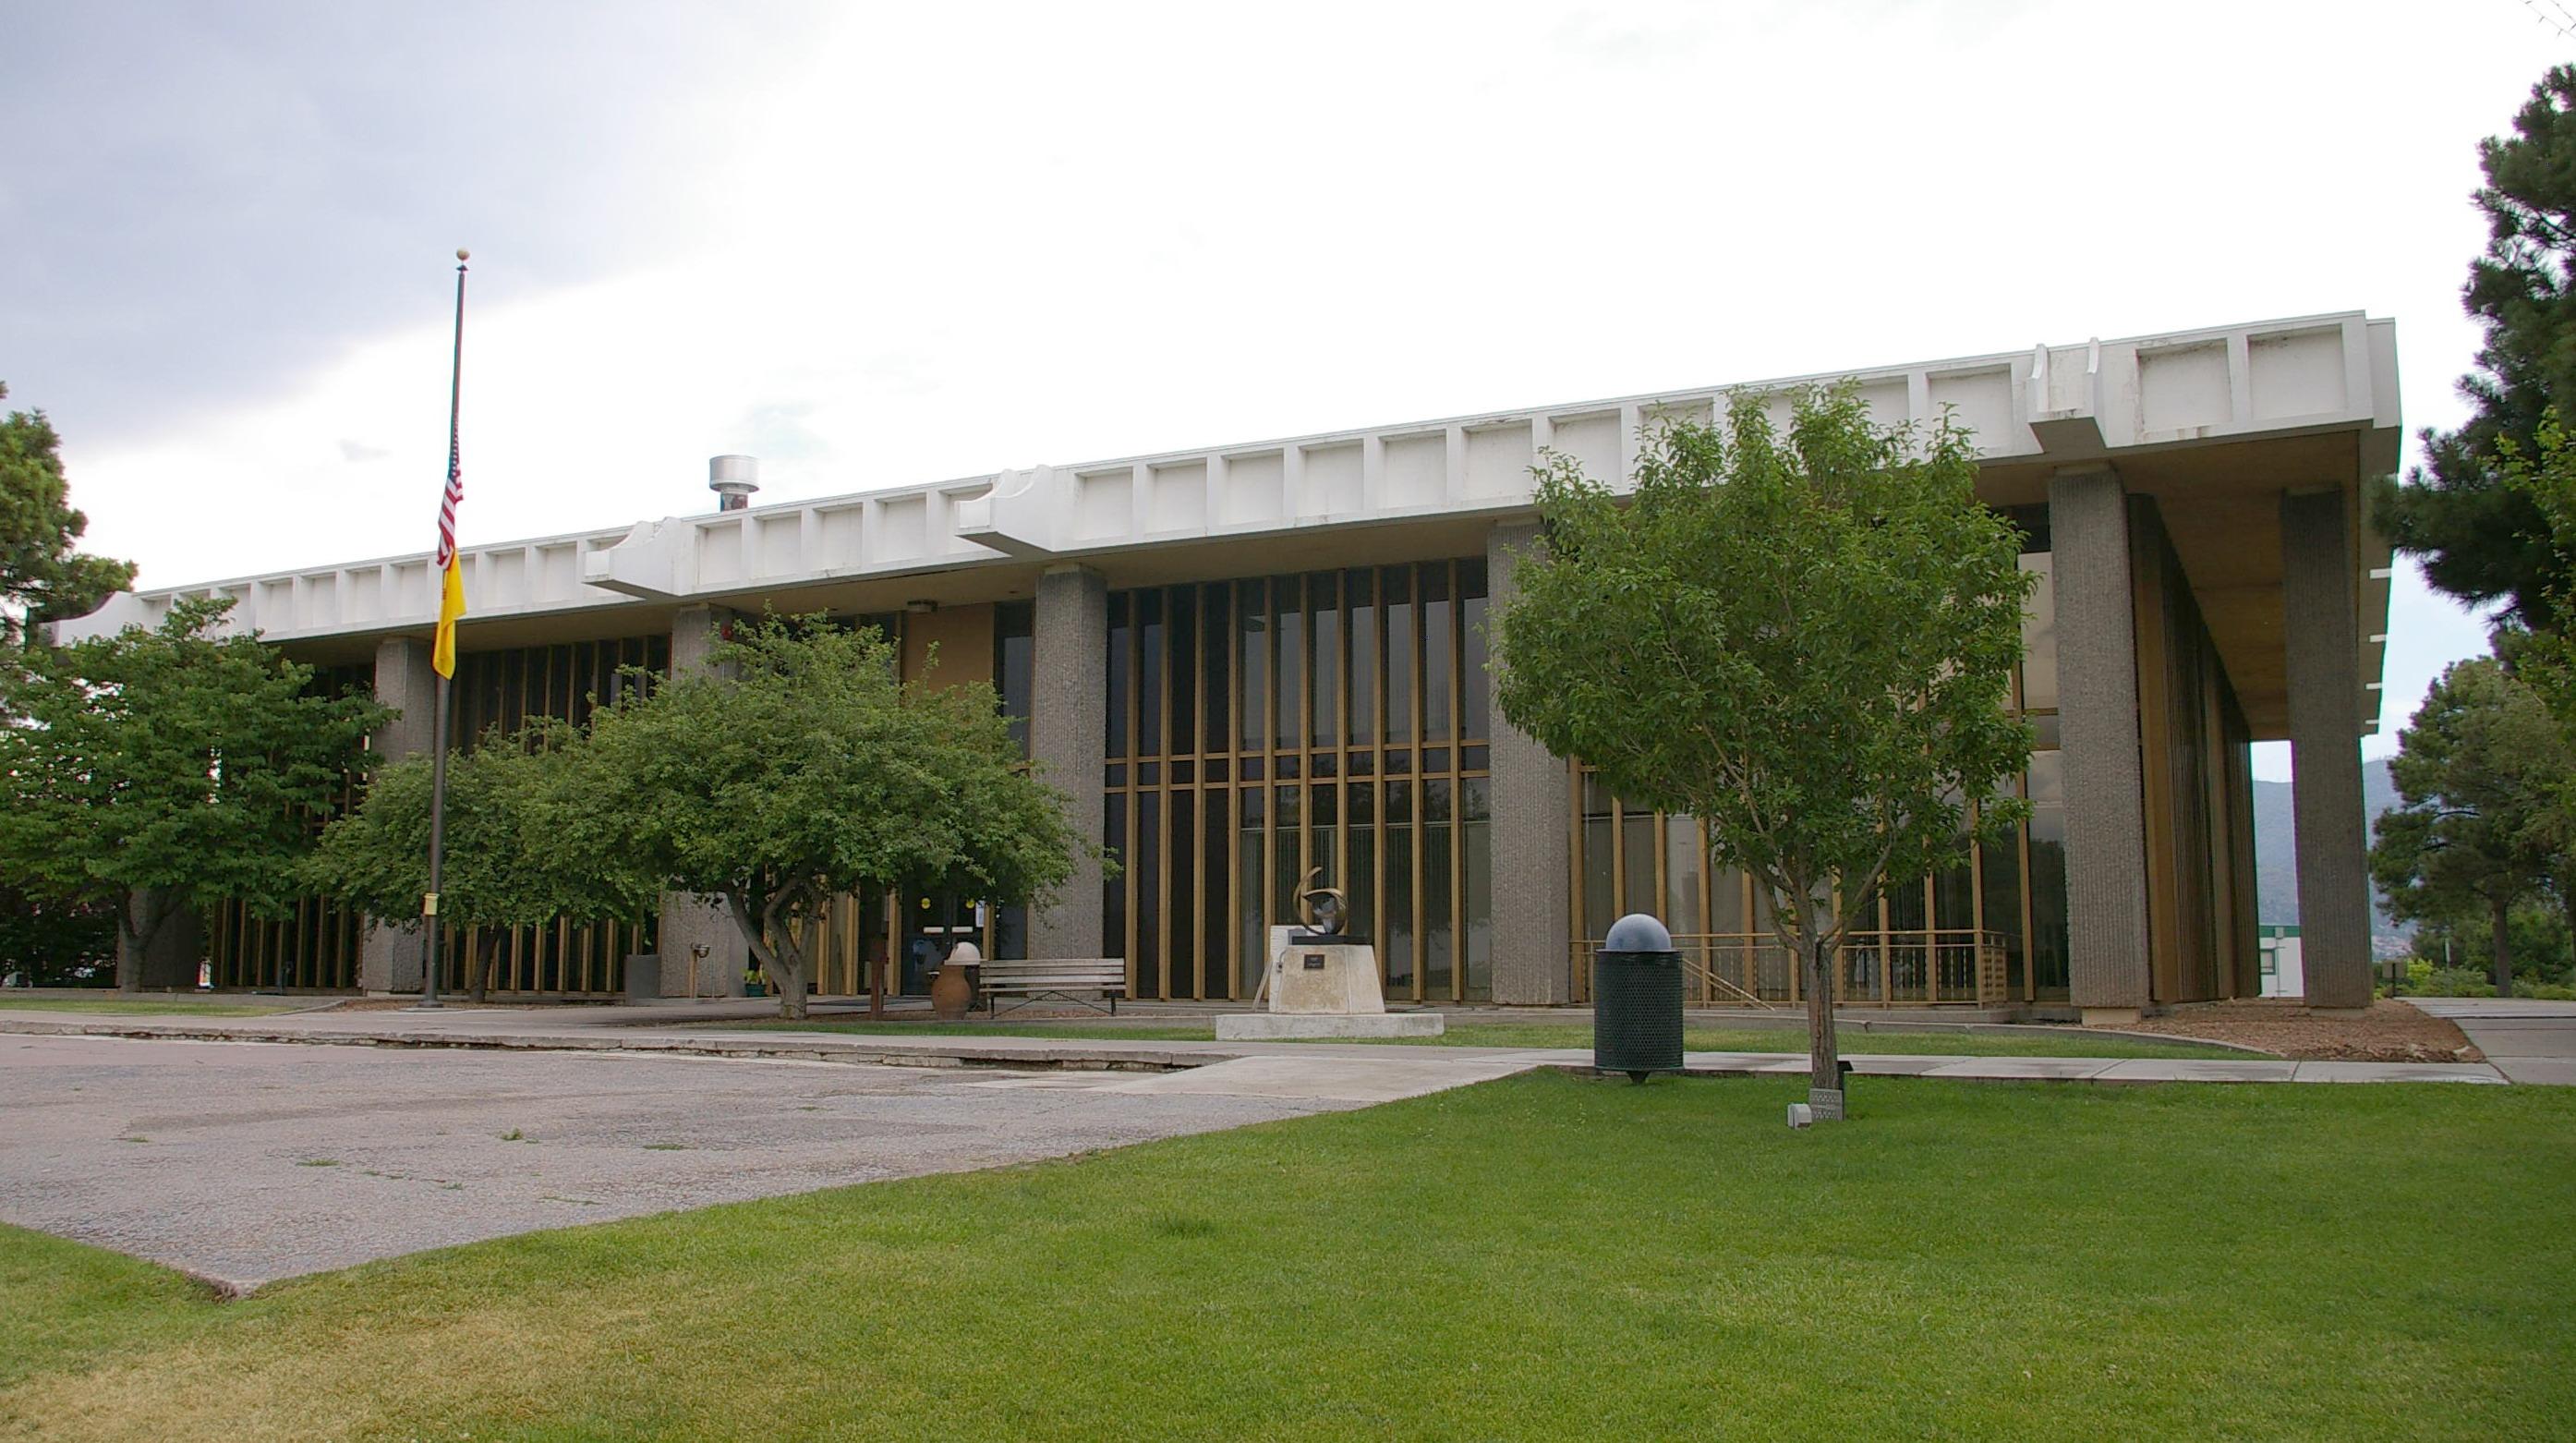 New mexico los alamos county los alamos - Former County Courthouse Los Alamos